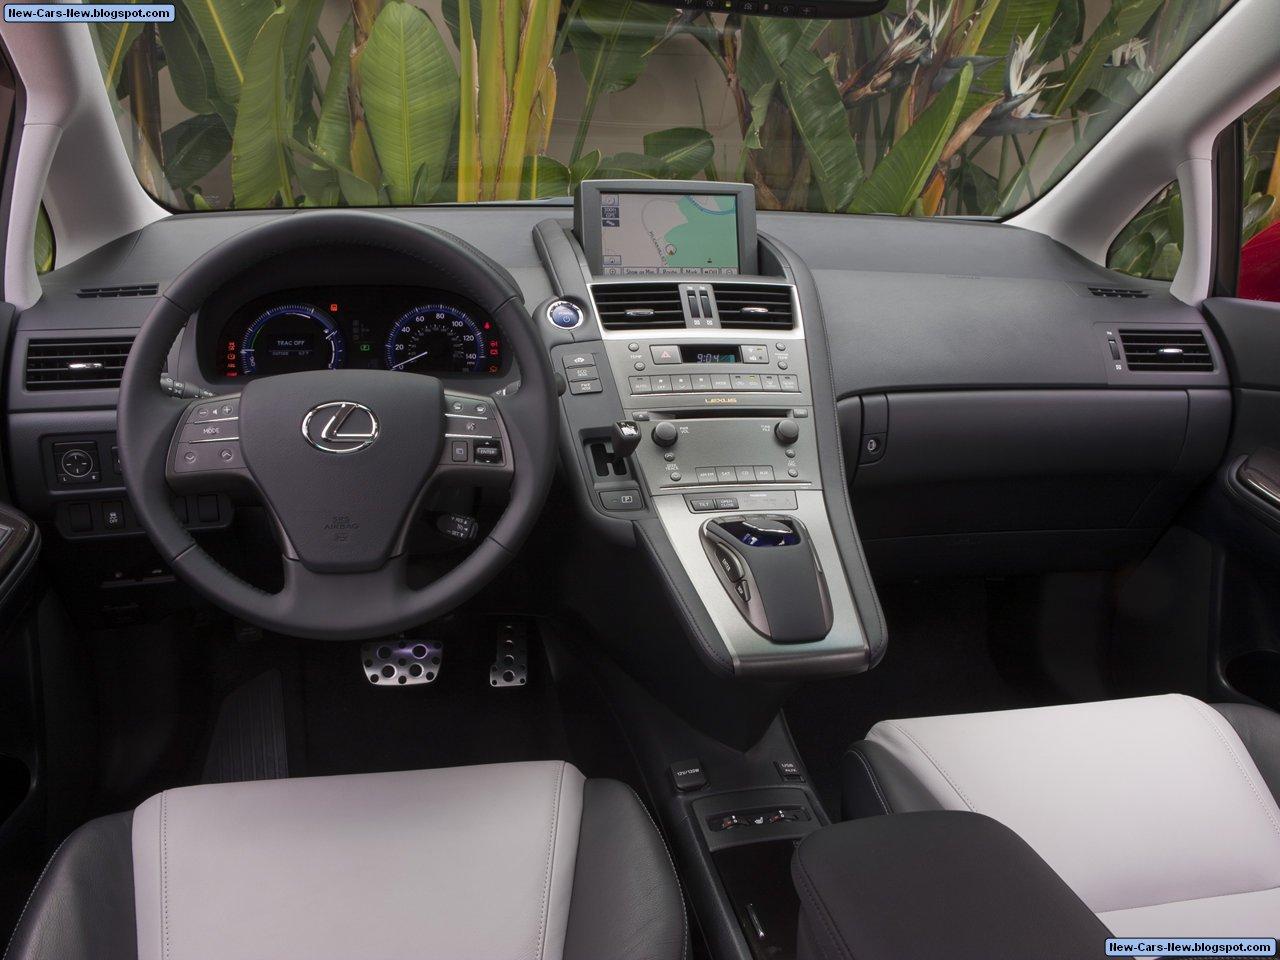 High Quality Lexus HS 250h (2010)